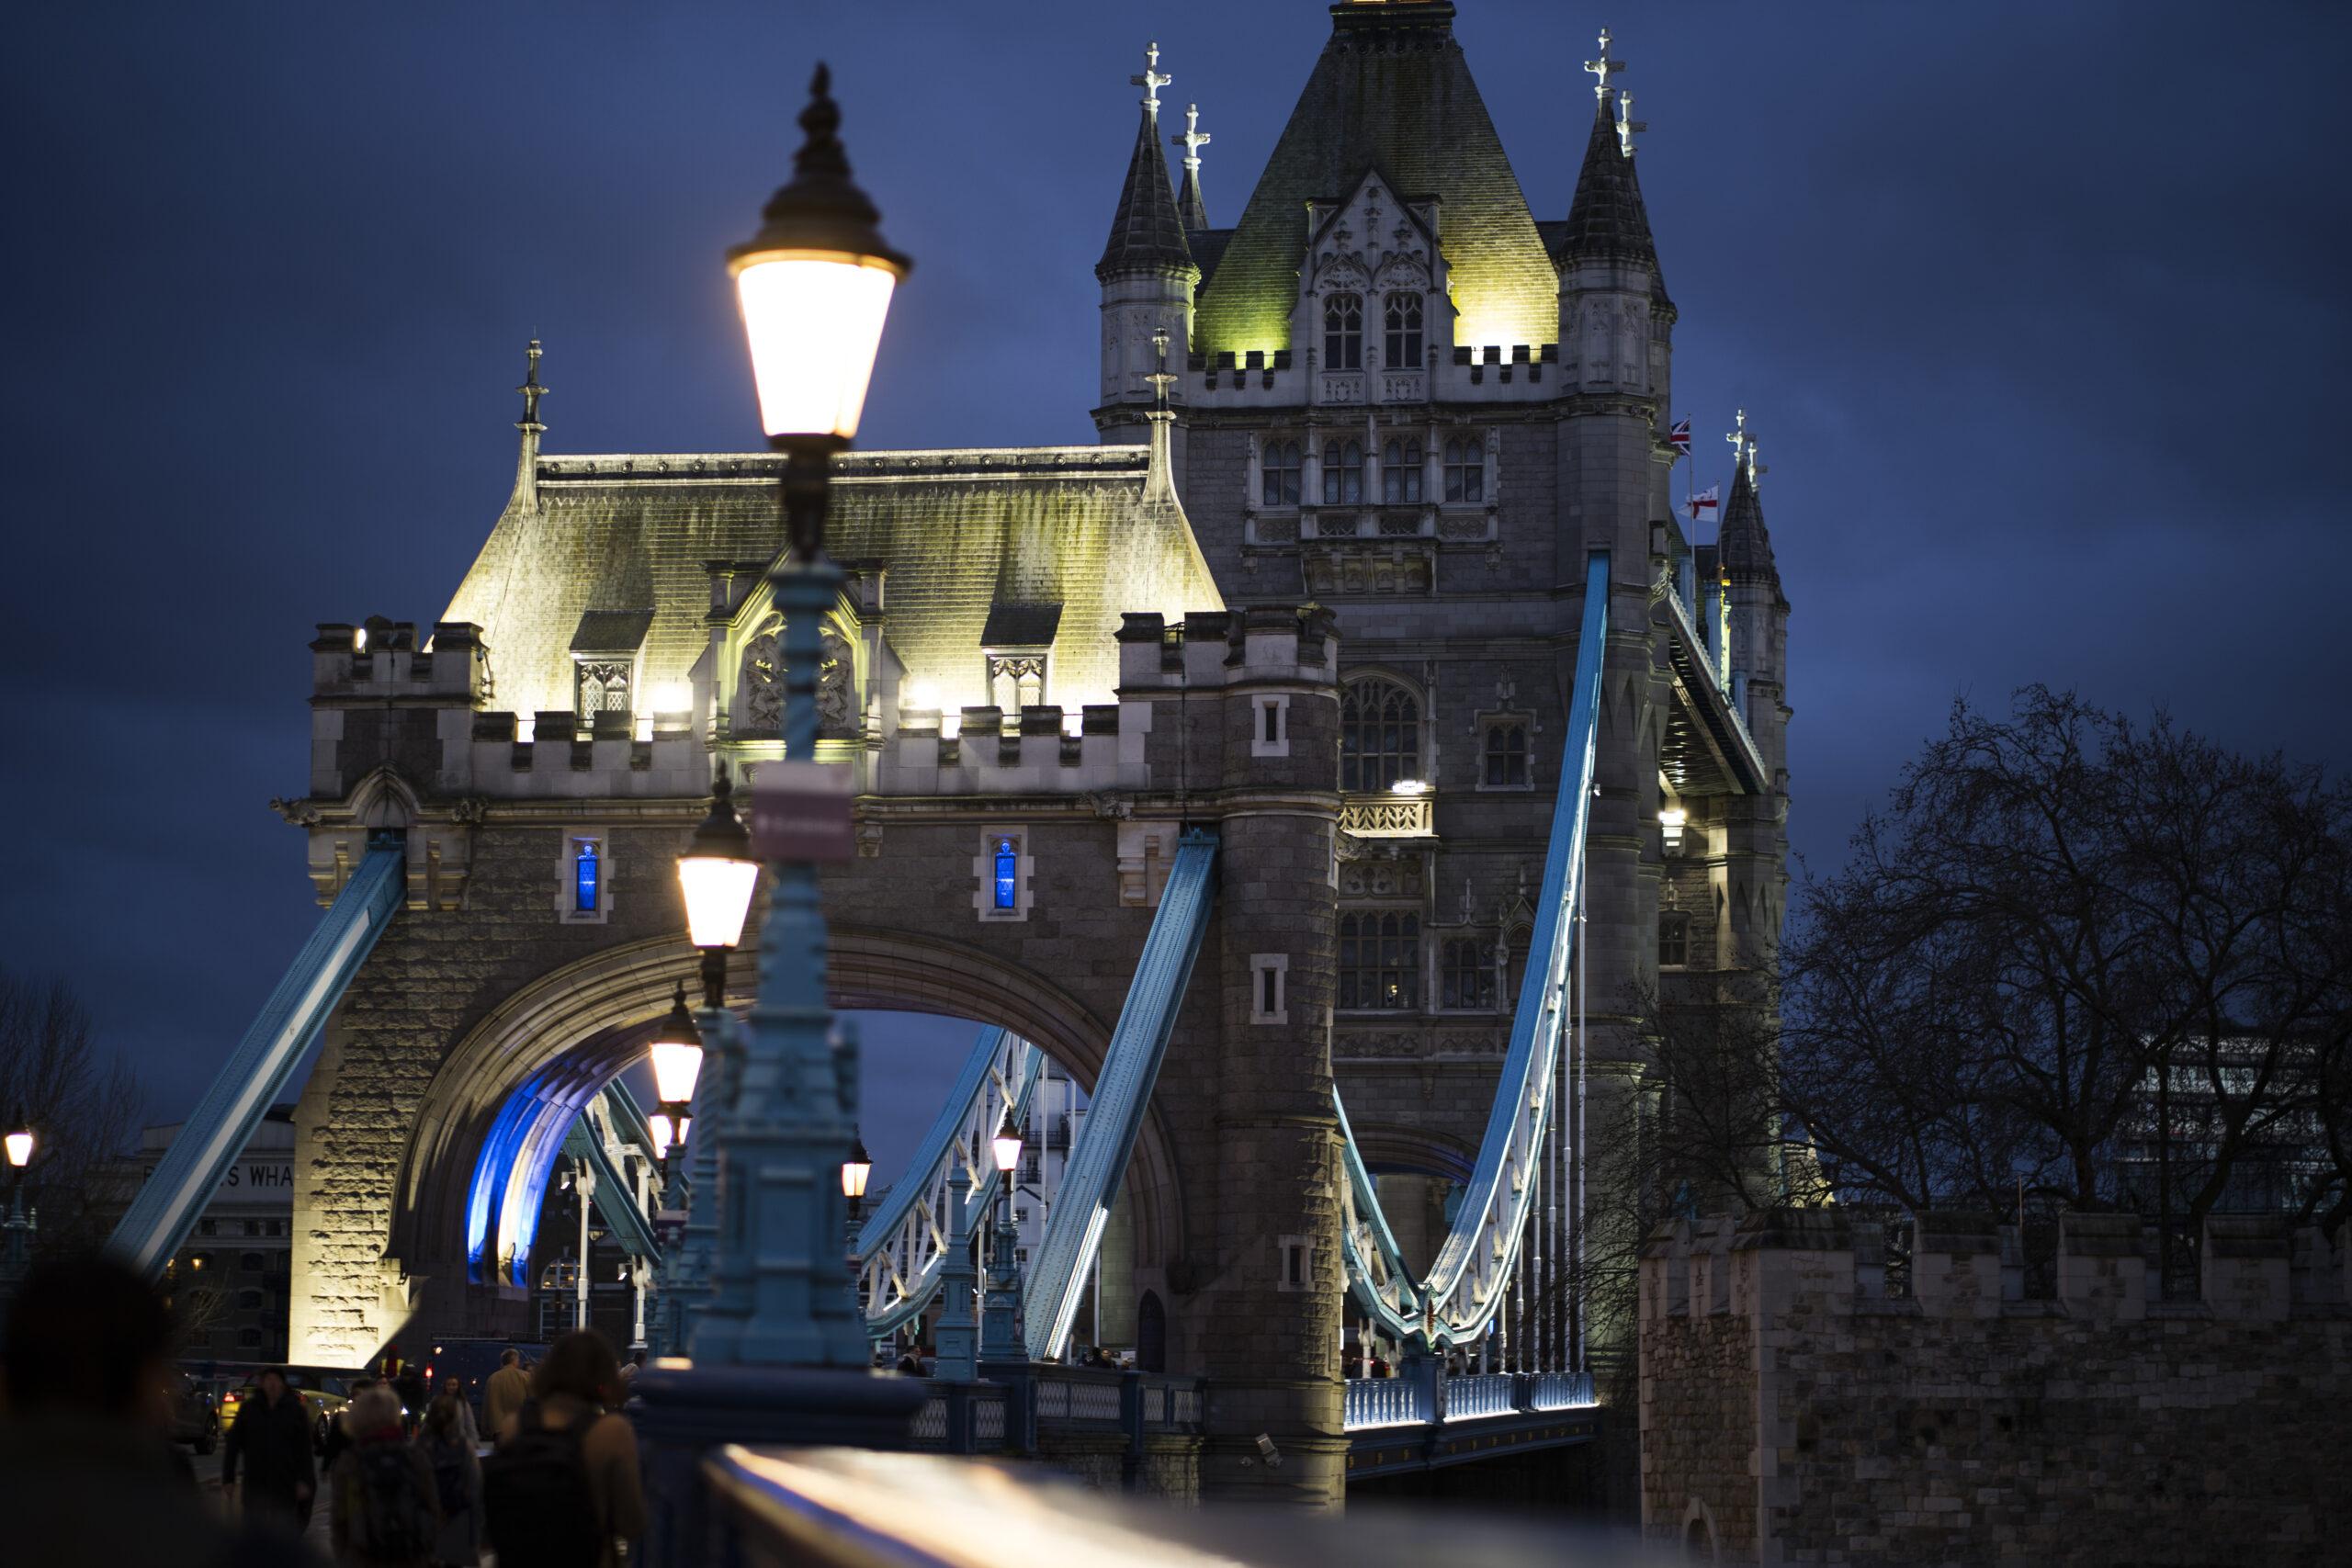 London towern